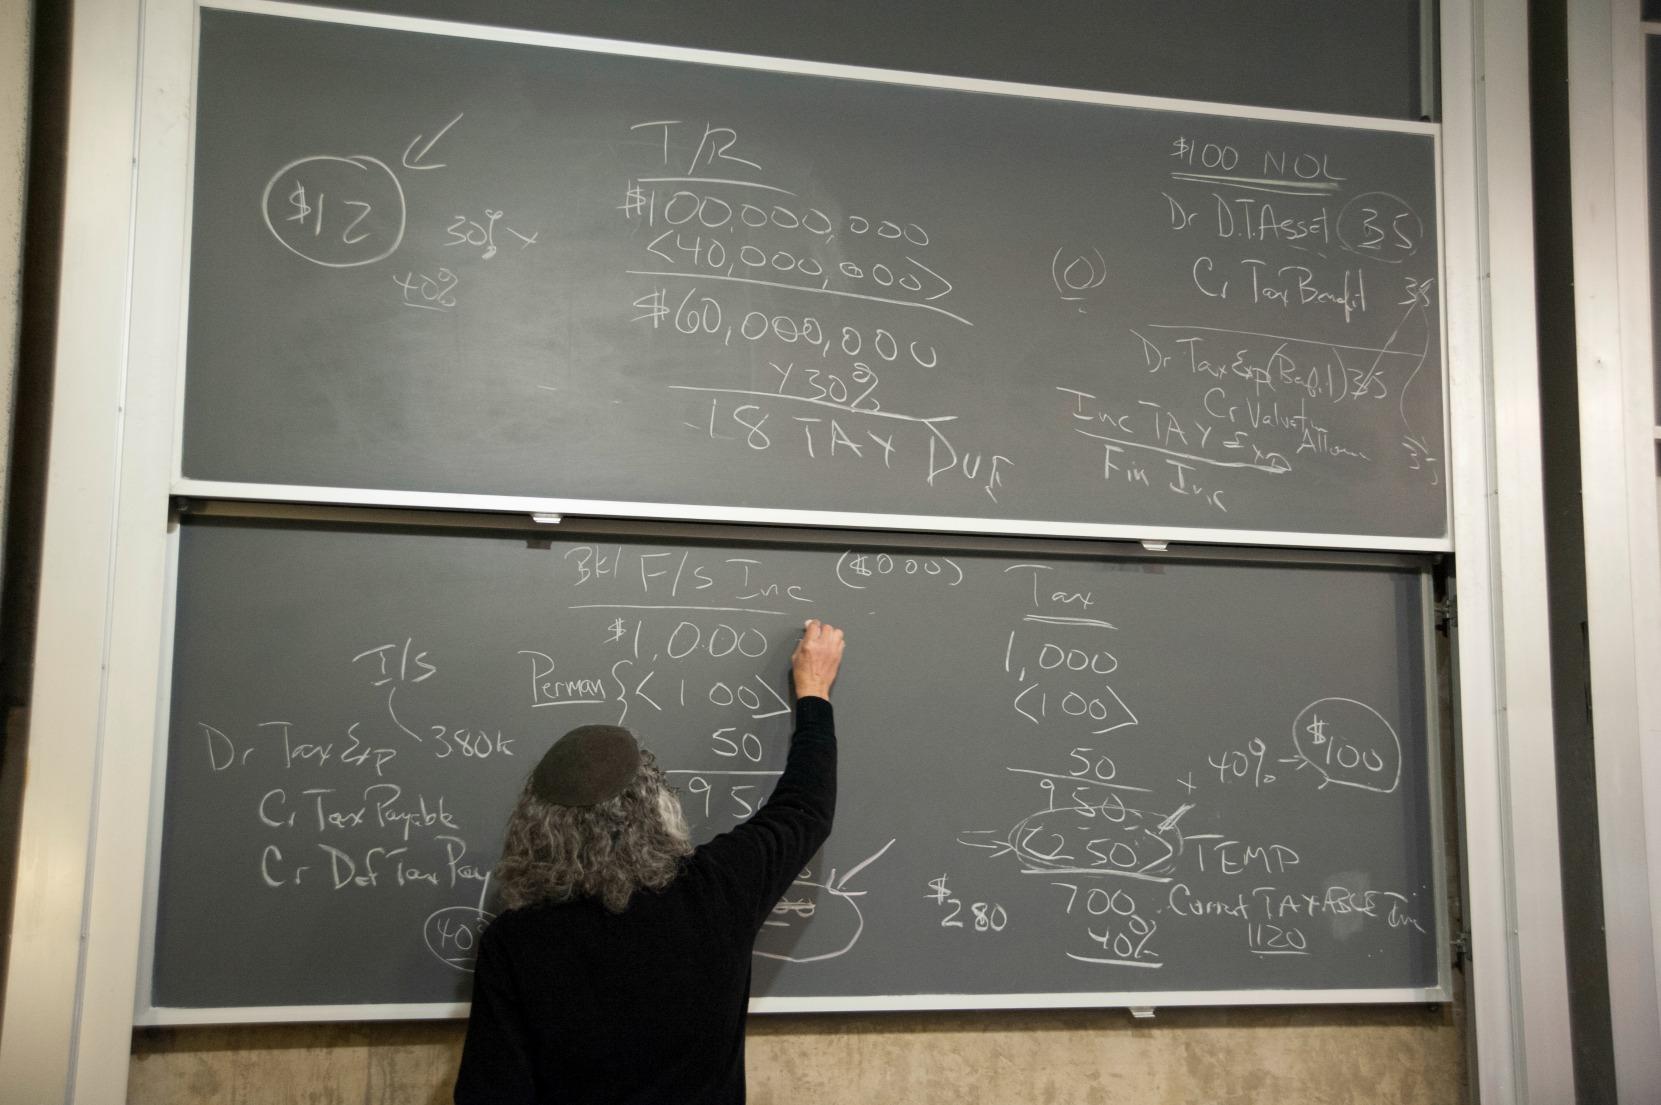 Professor Leonard Fuld teaches the Federal Income Taxation I course in the master's program.